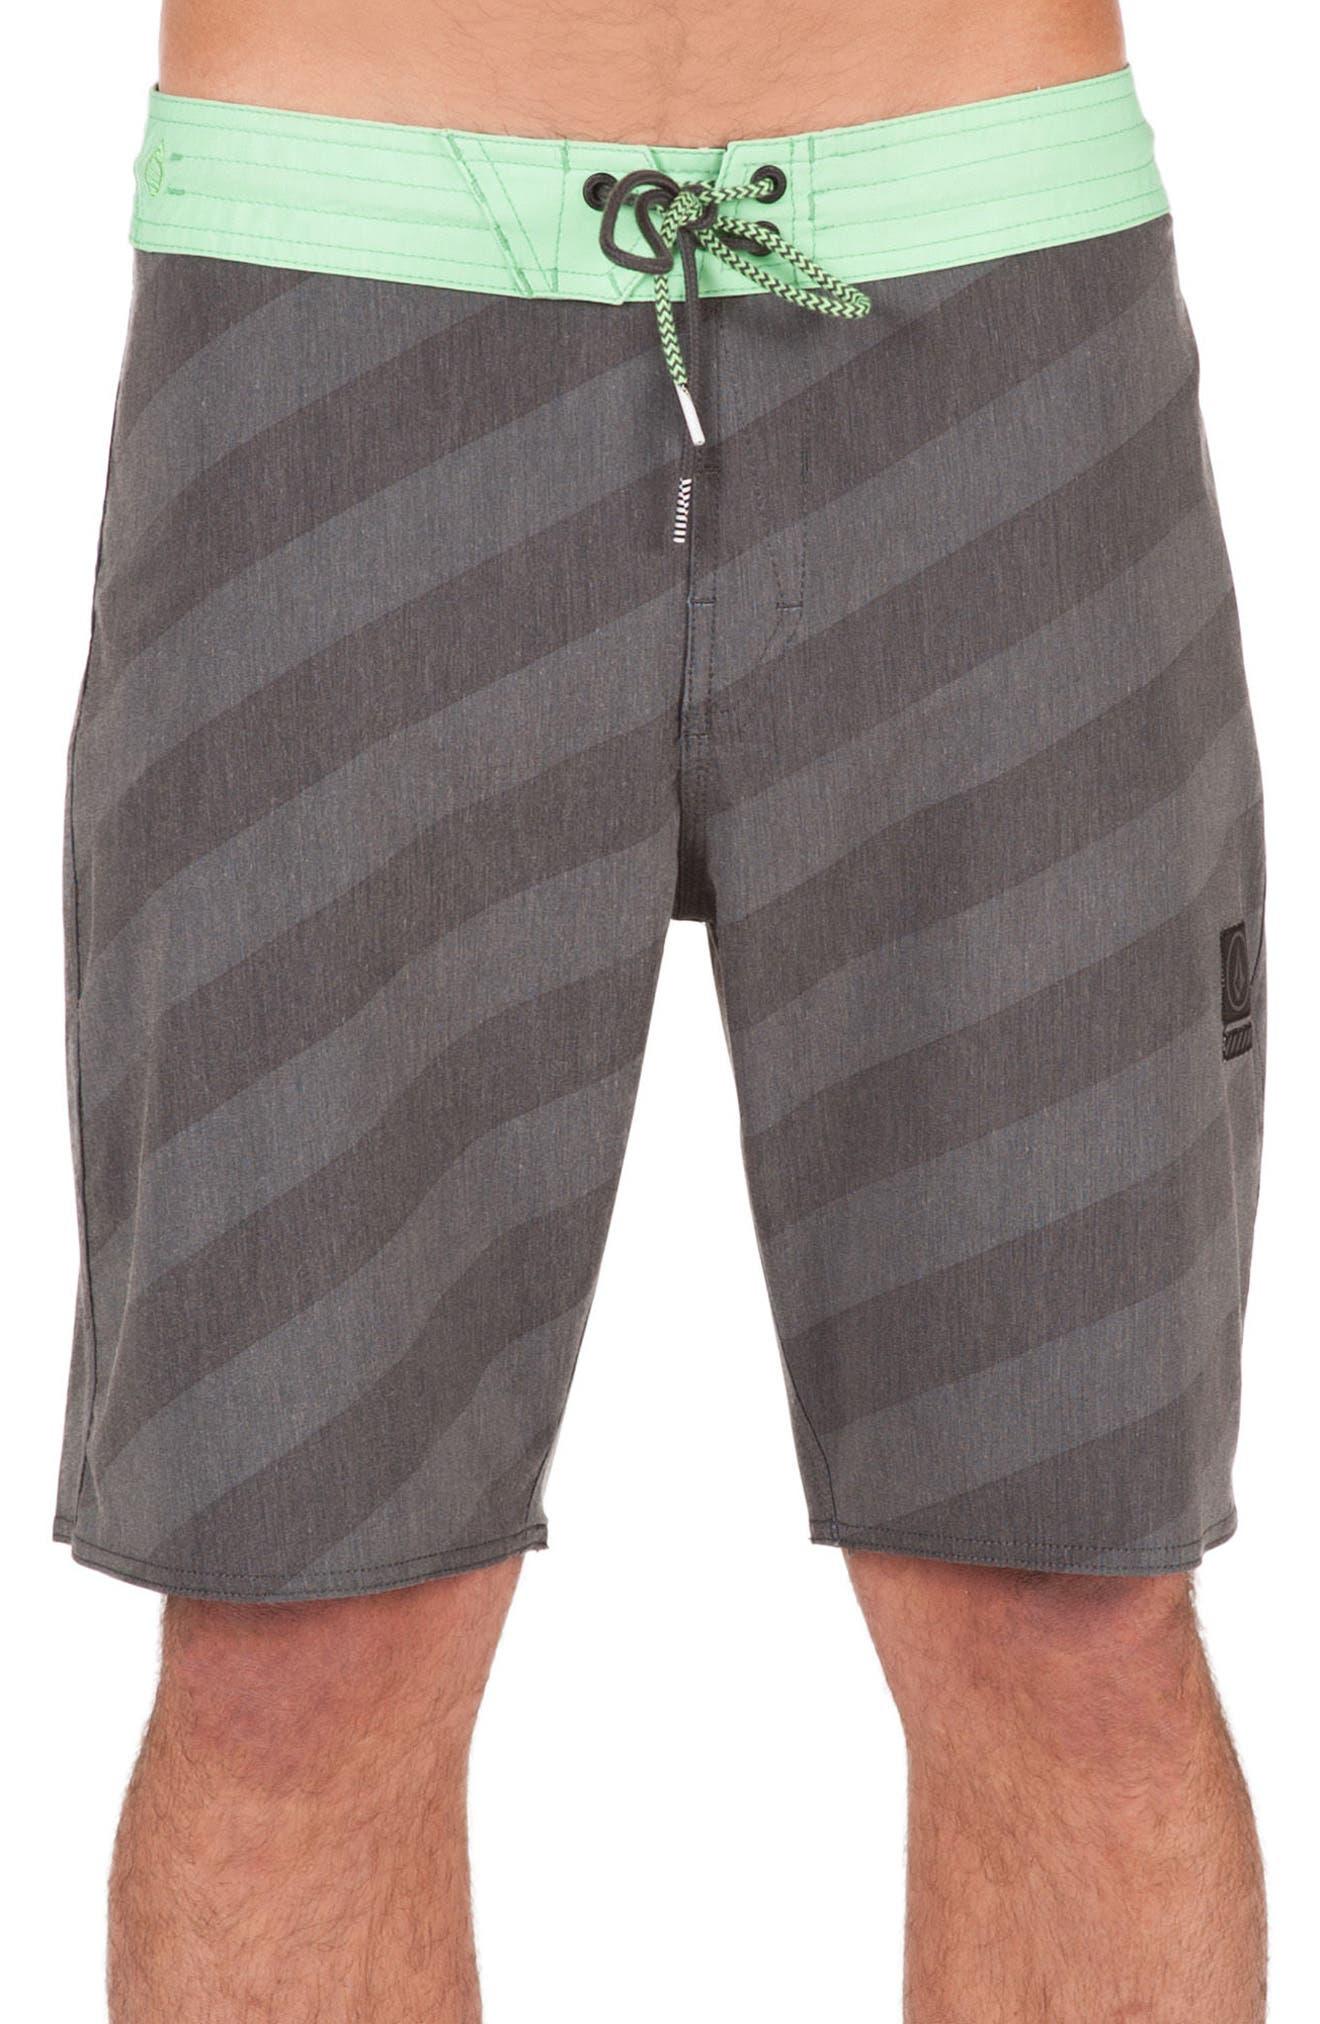 Stripey Slinger Board Shorts,                             Main thumbnail 2, color,